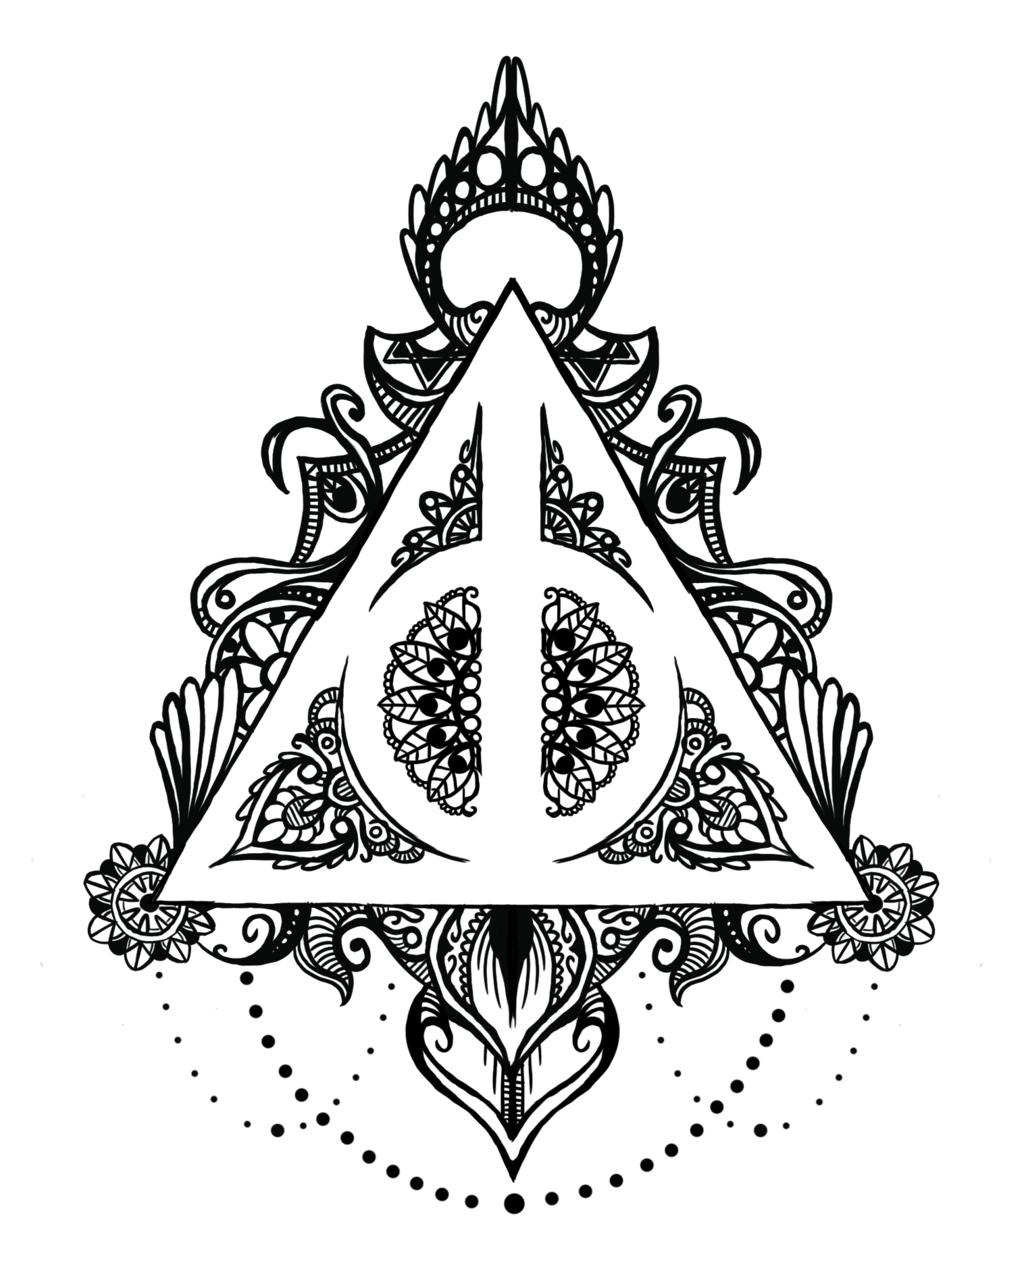 Deathly Hallows Mandala by midlifebeef51 on DeviantArt